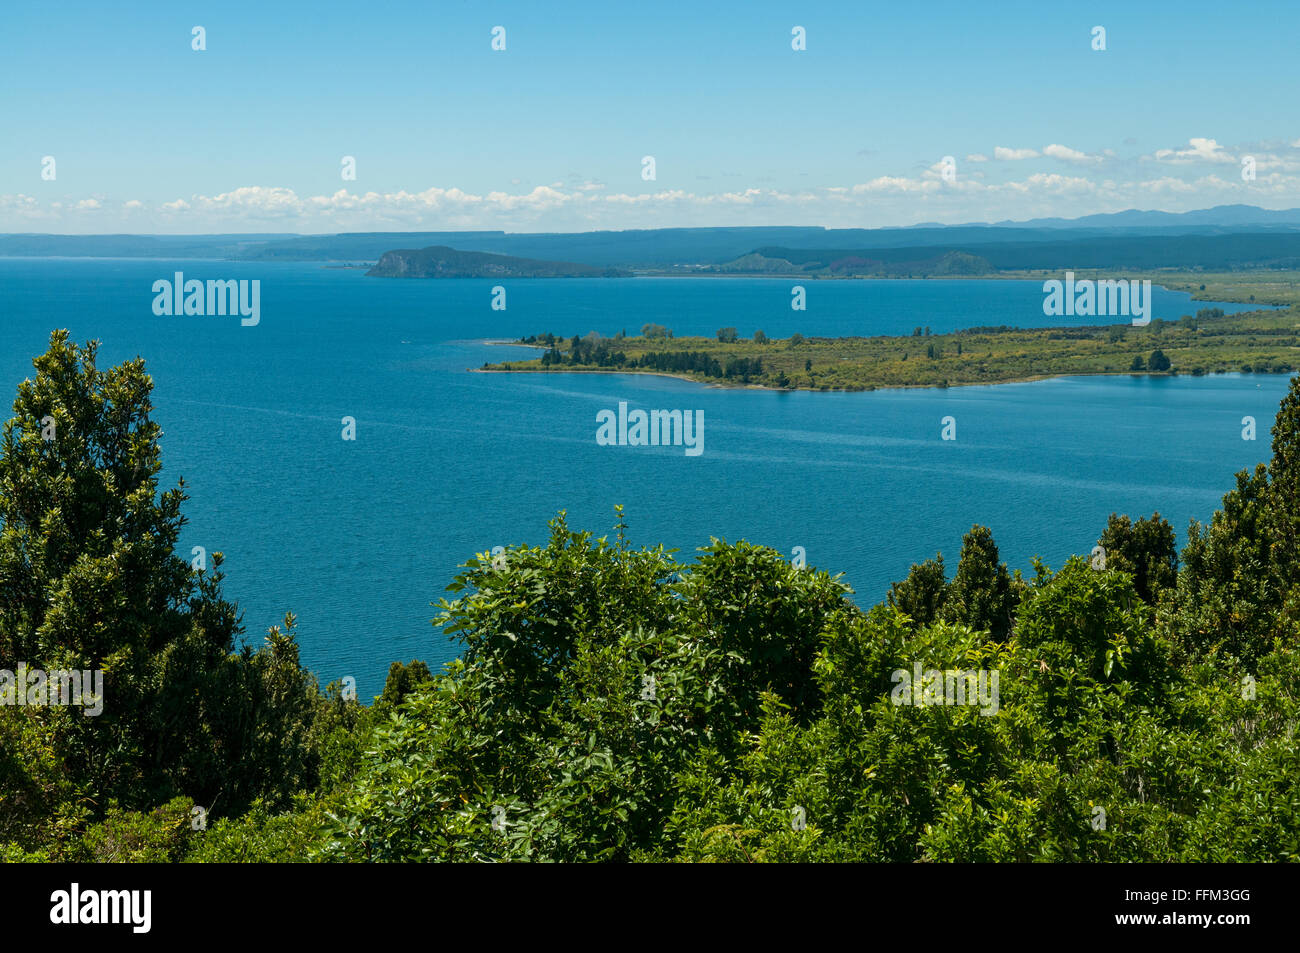 Lake Taupo, near Tokaanu, Waikato, New Zealand - Stock Image